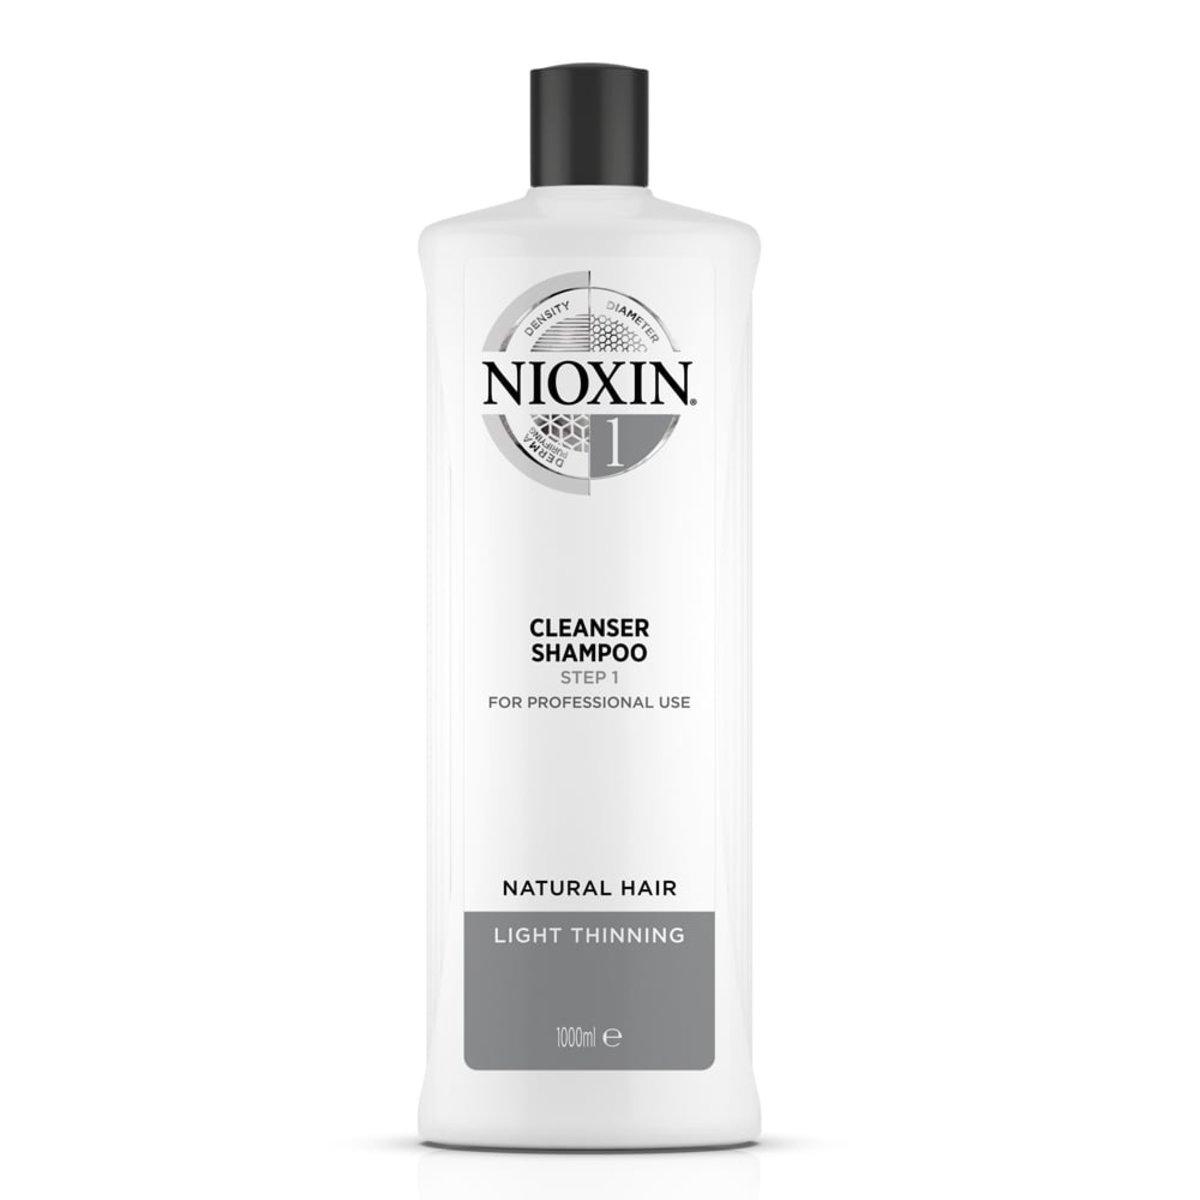 Cleanser Shampoo #1 1000 ml